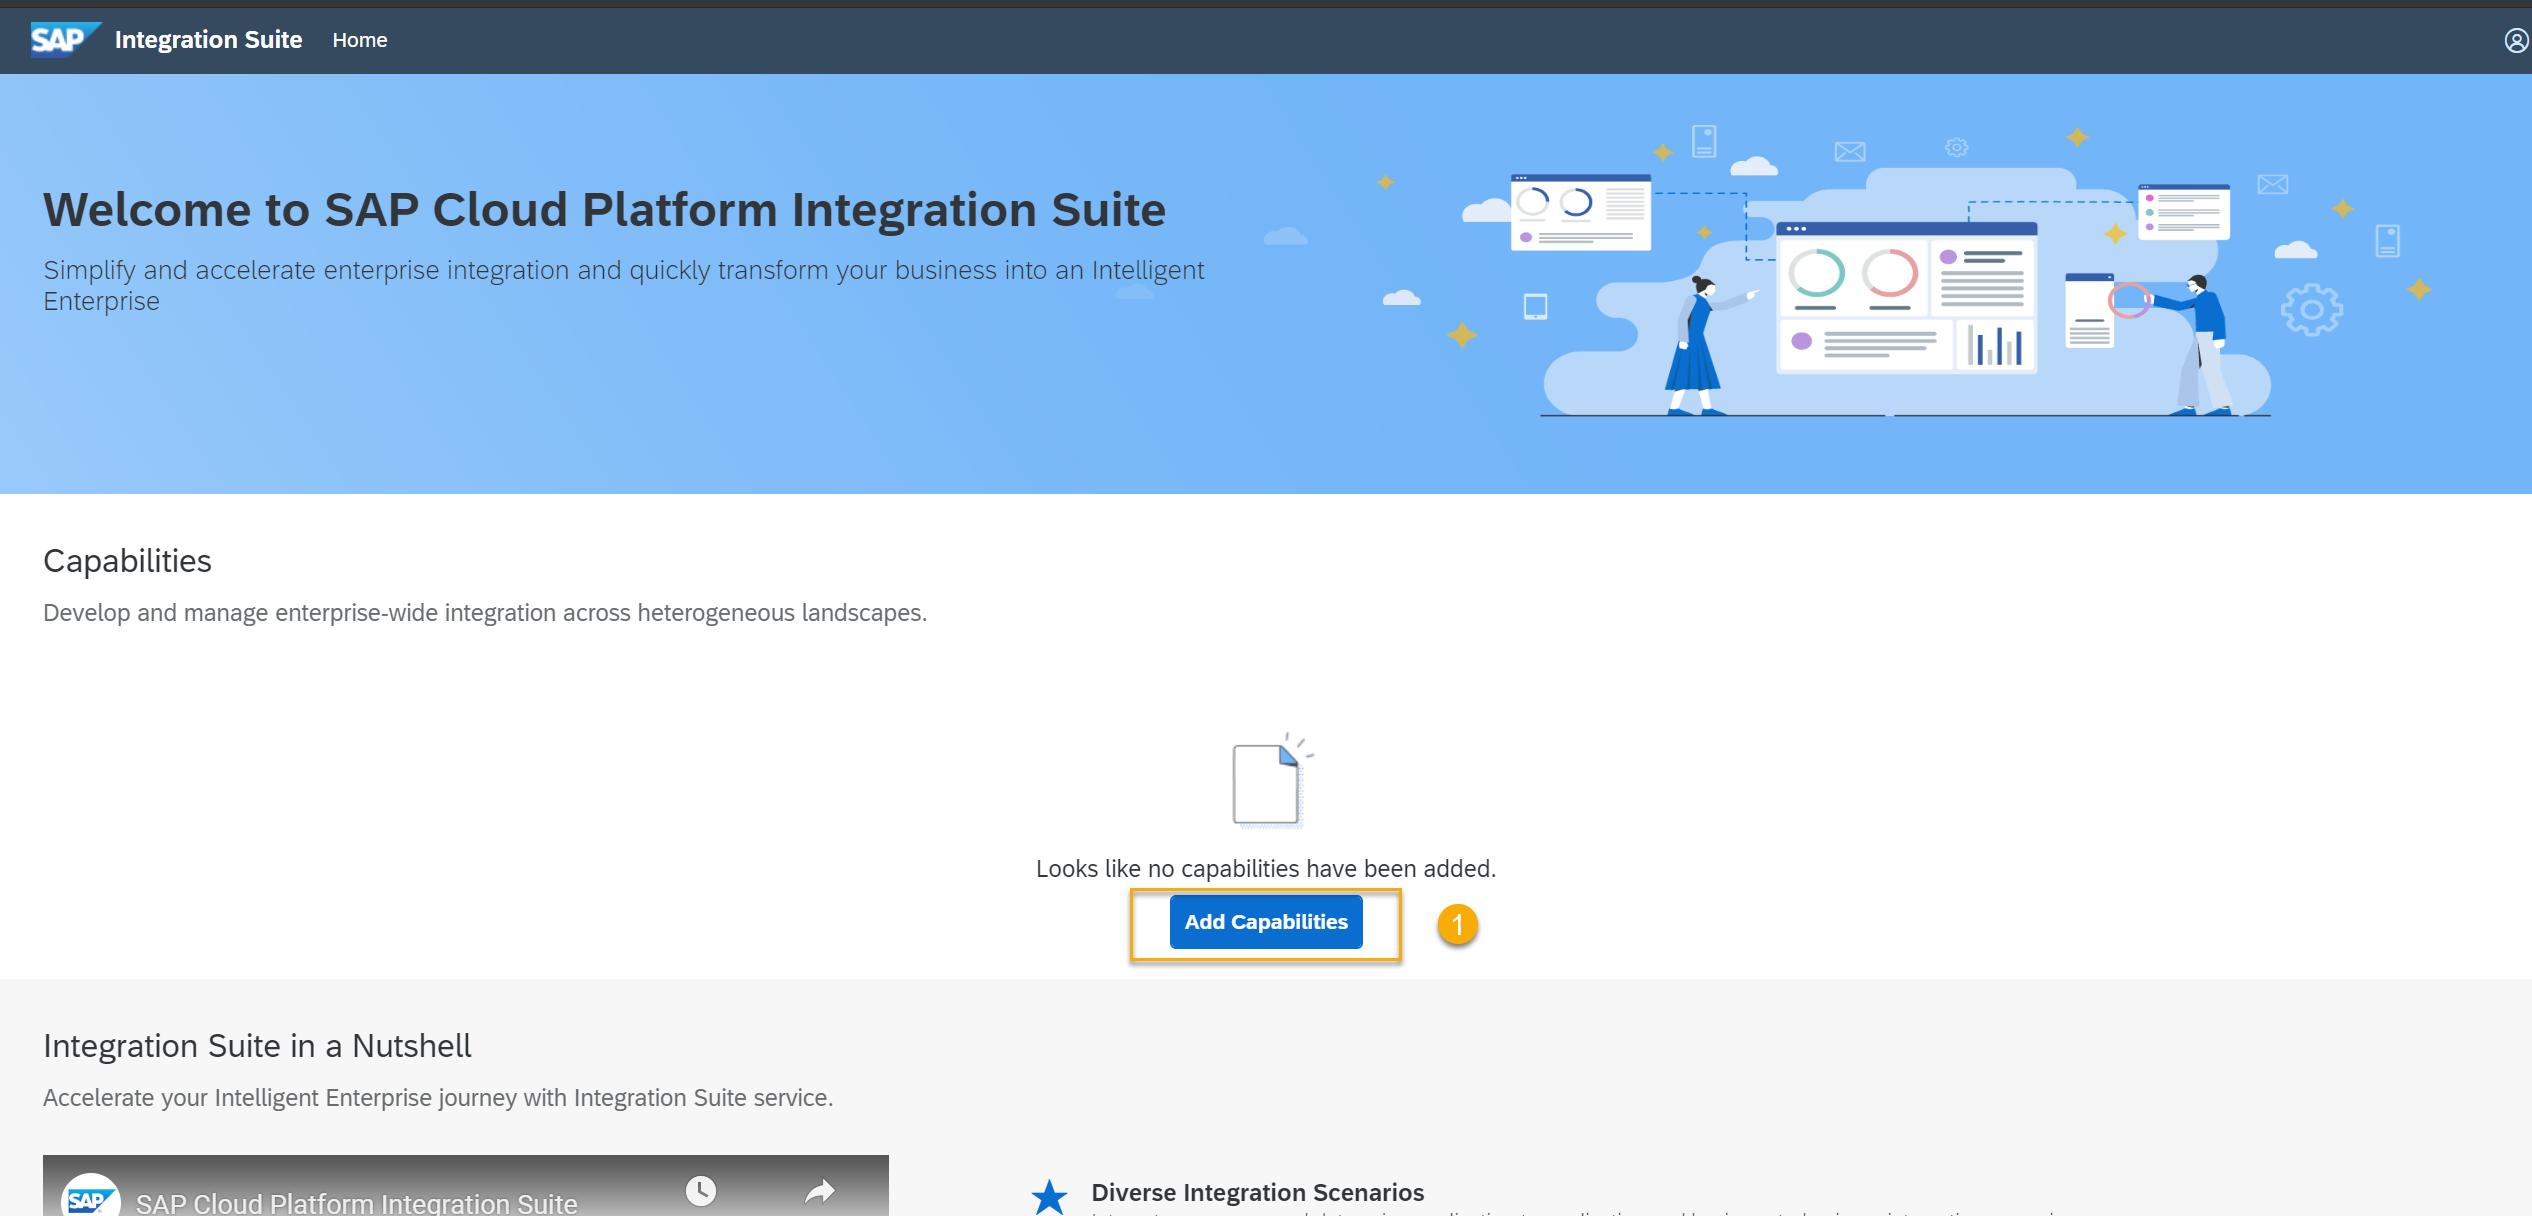 Integration%20Suite%20Launchpad-%20Add%20Capabilties